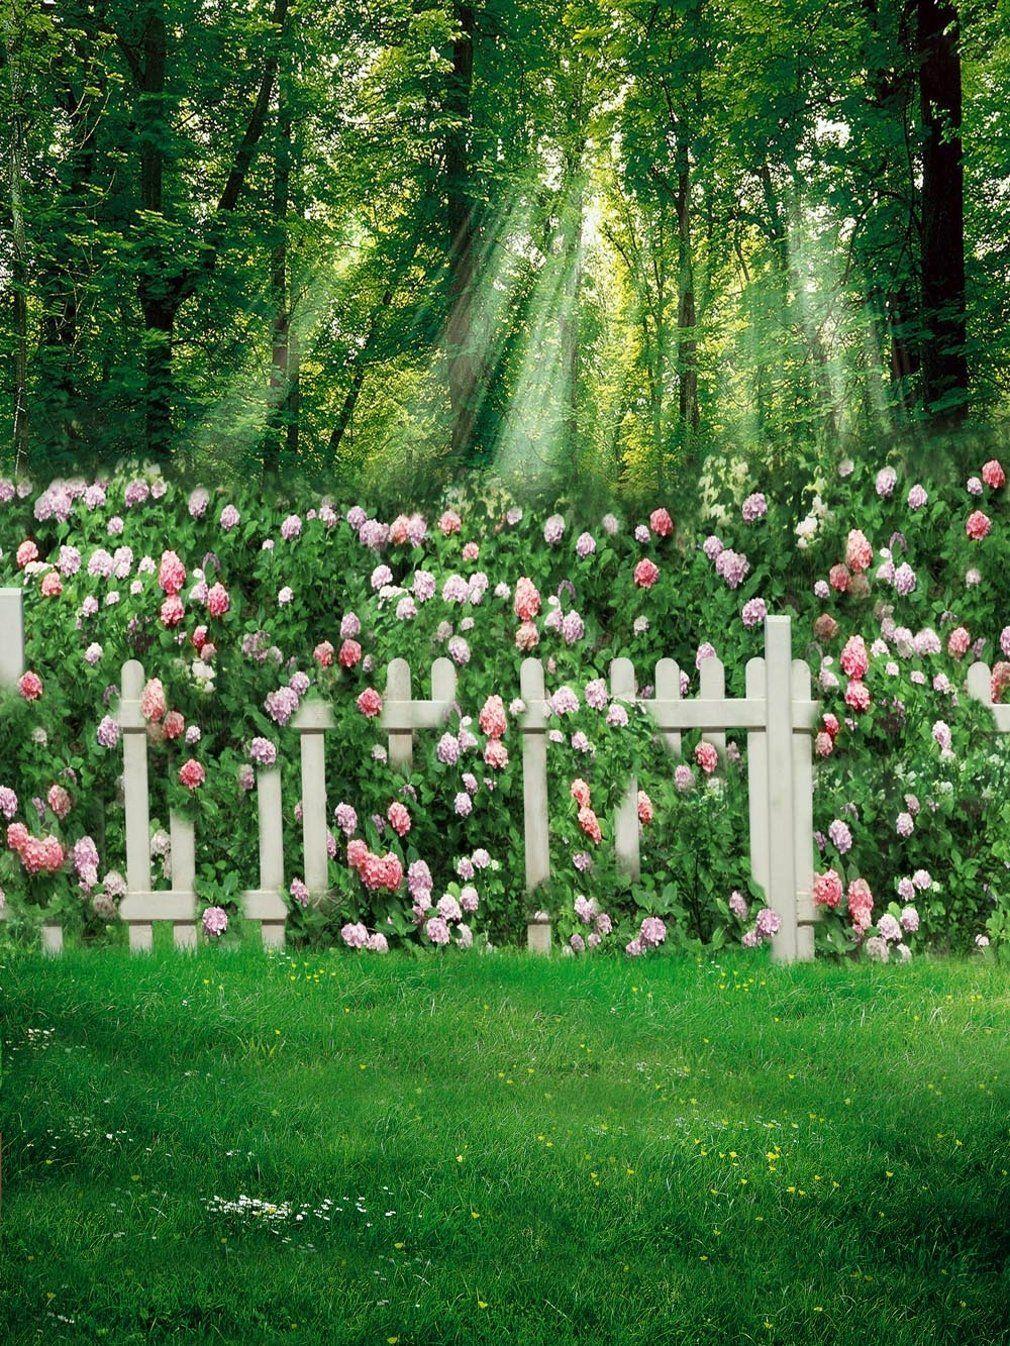 2019 Spring Flower Garden Backgrounds Green Grassland White Fence